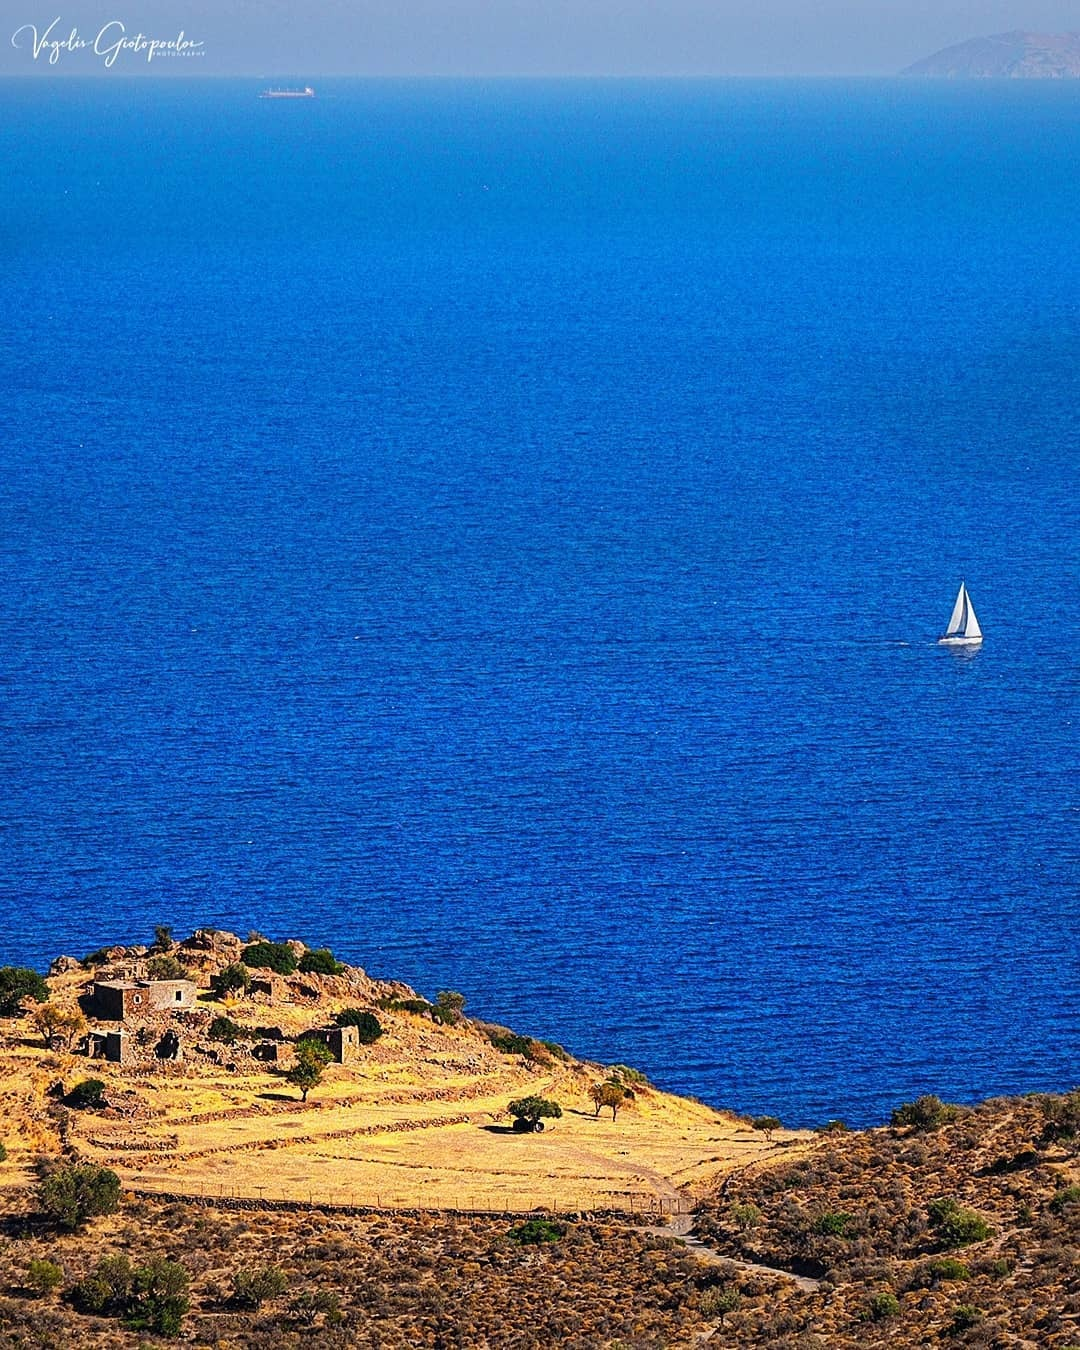 Aegina - Greece by Vagelis Giotopoulos. #greece#europe#seascape#sea#travel#aegina#saronic islands#sea view#greek islands#central greece